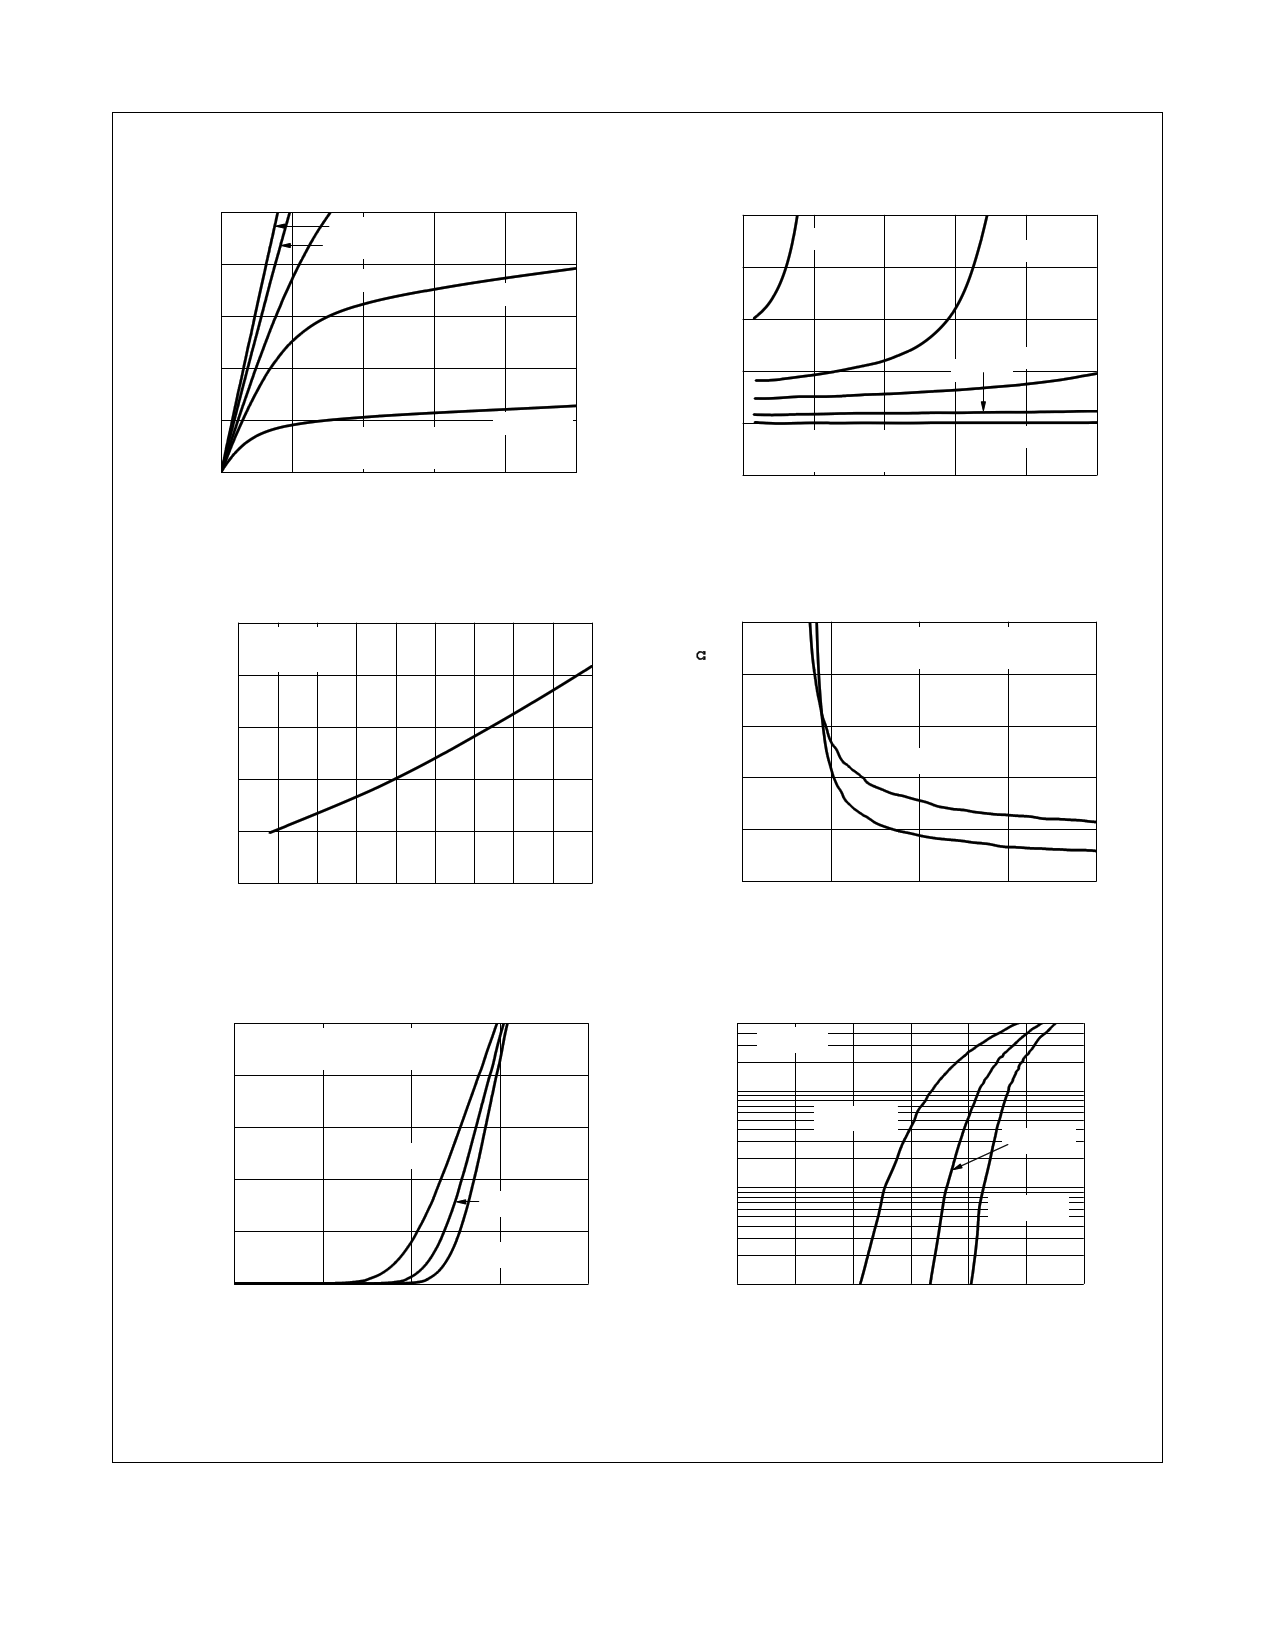 FDMS3669S pdf, 반도체, 판매, 대치품